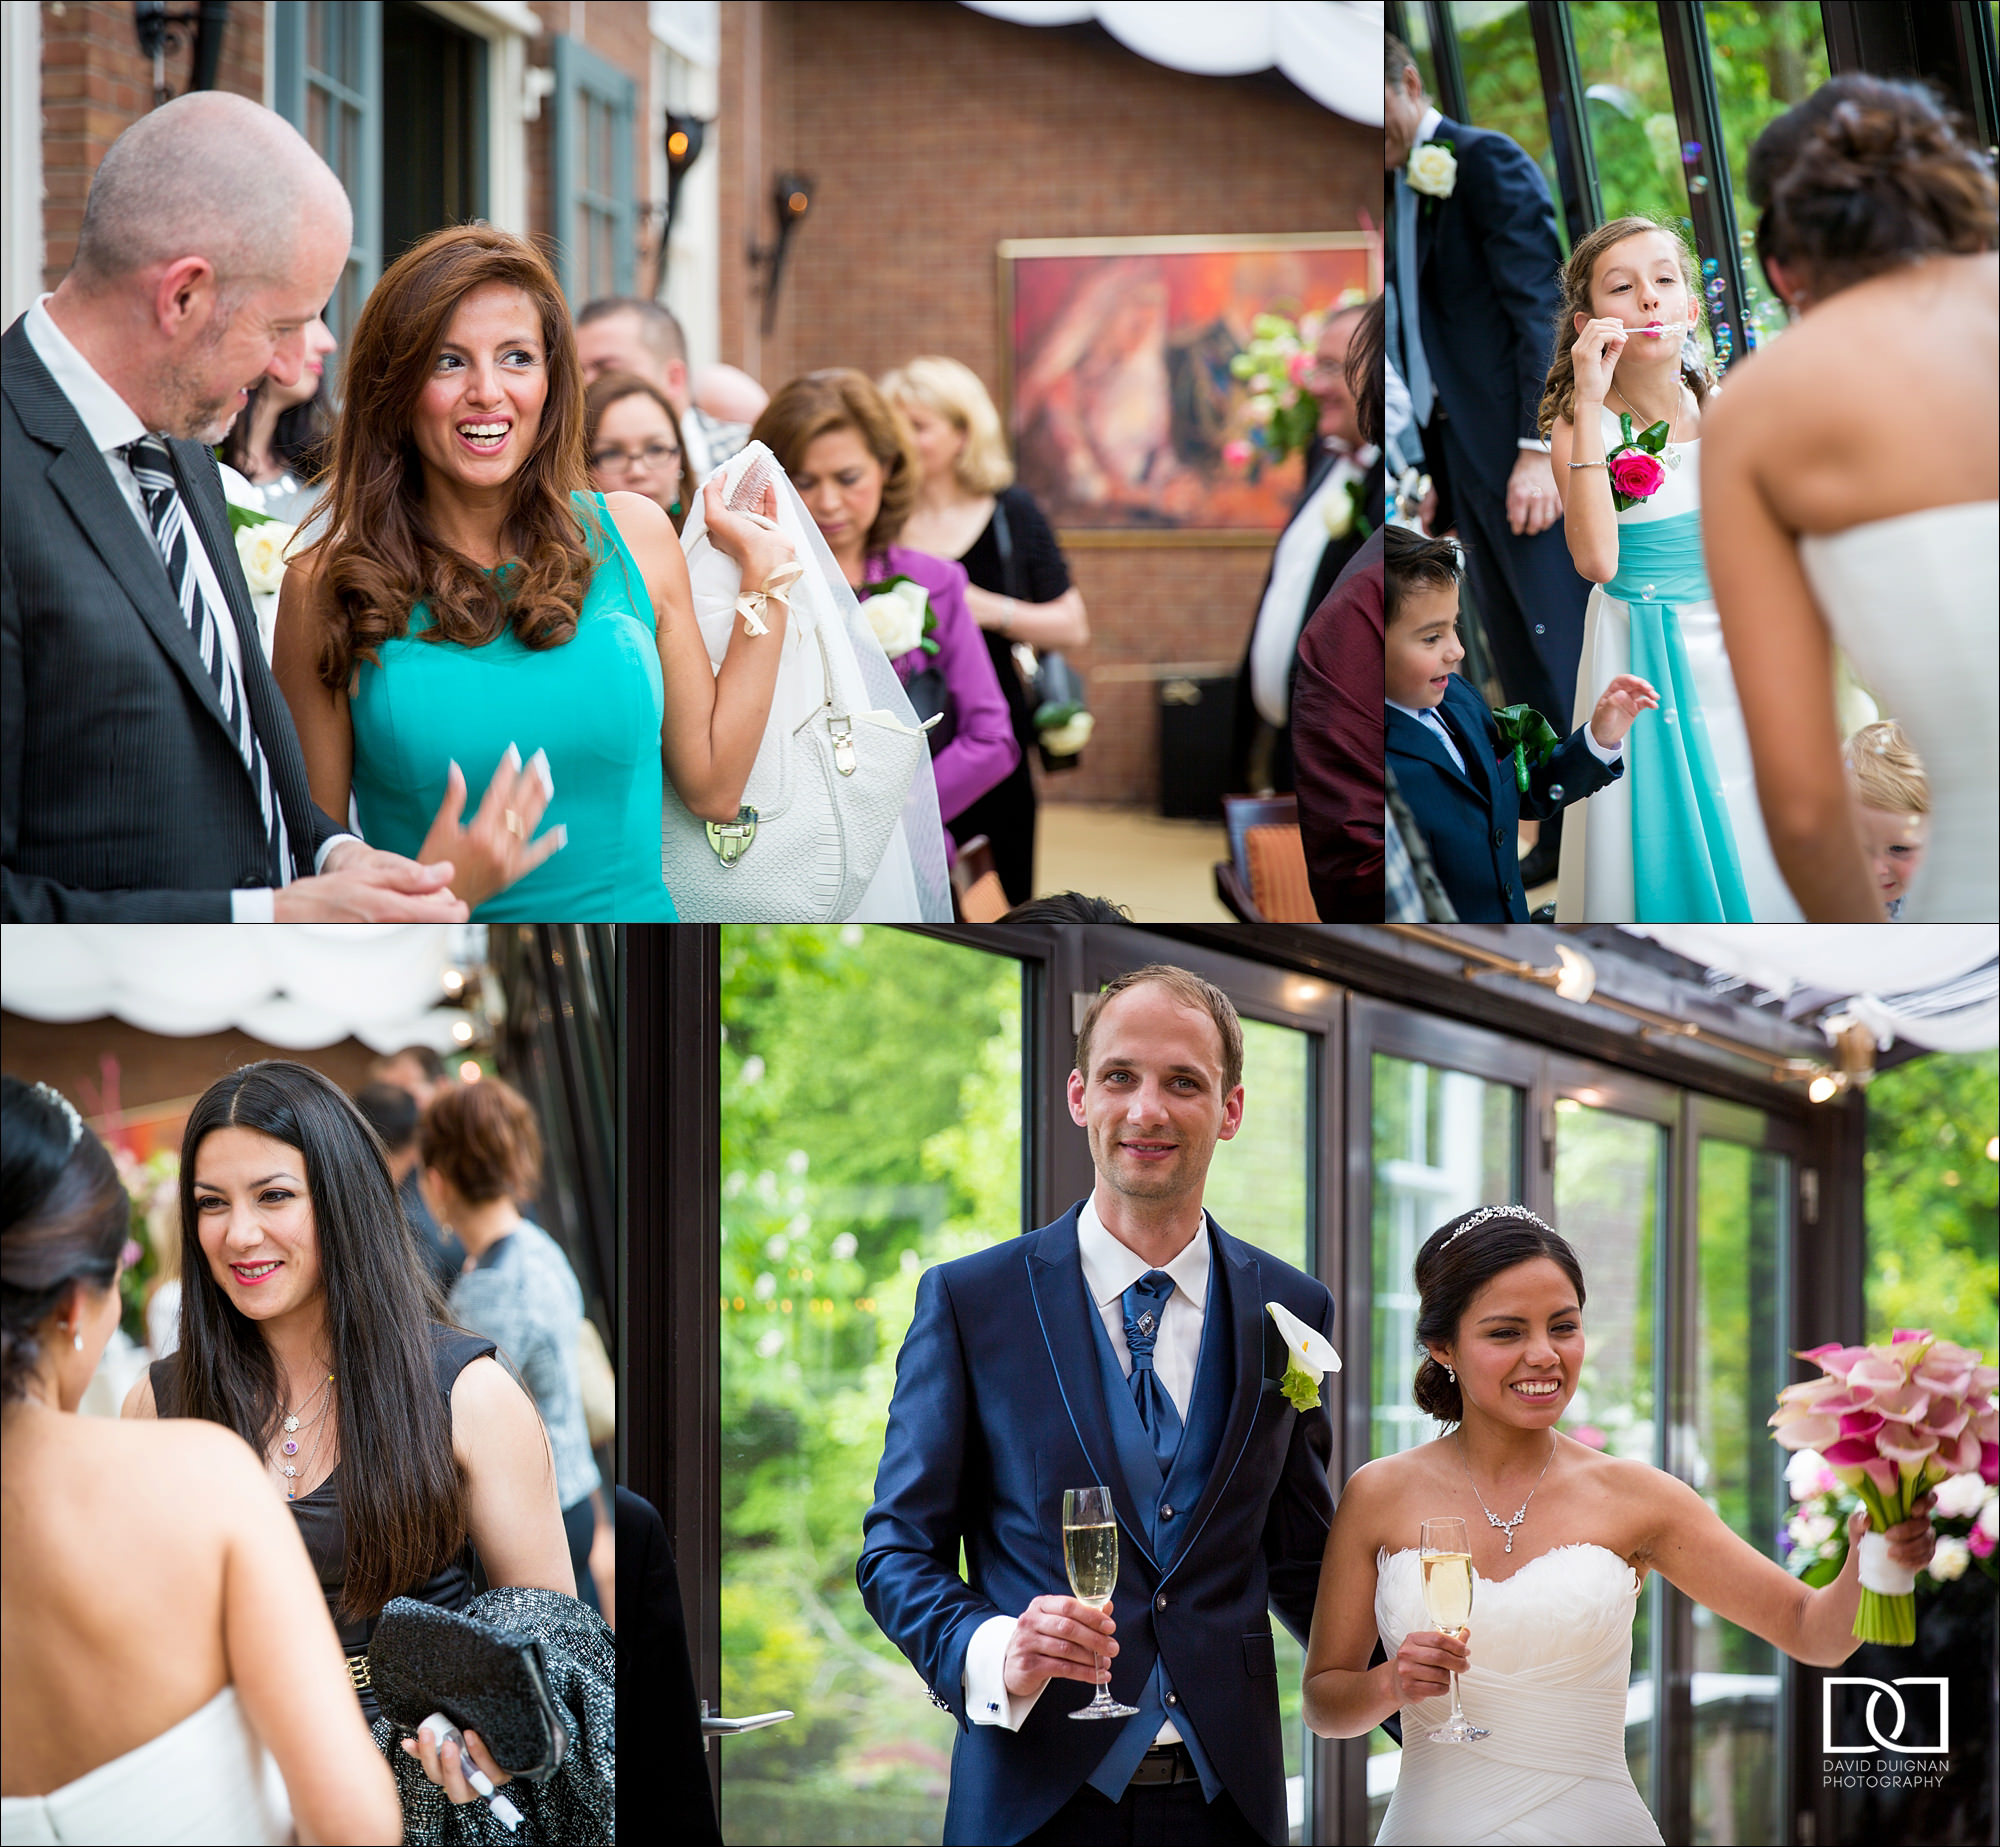 dublin wedding photographer david duignan photography wedding photos 0030